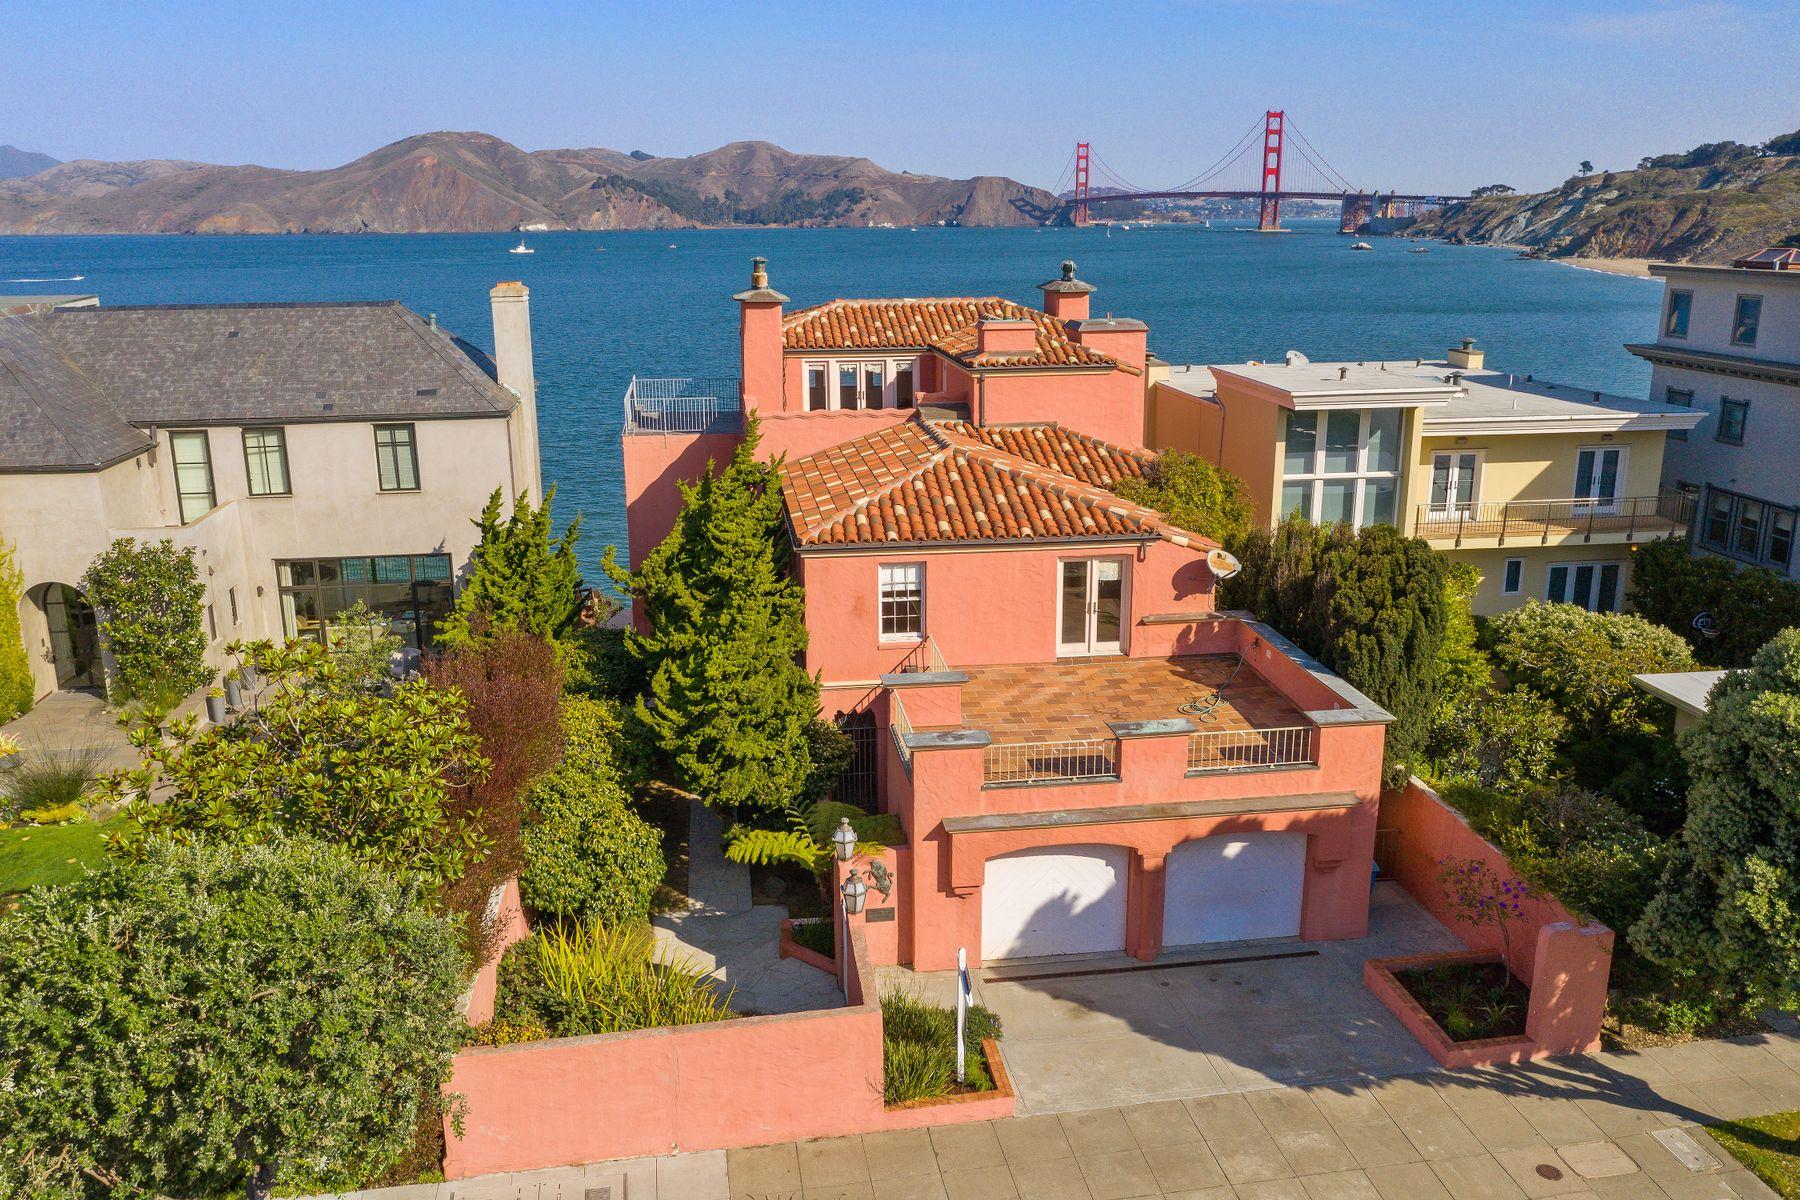 Single Family Homes for Sale at Unique Sea Cliff Home 224 Sea Cliff Ave San Francisco, California 94121 United States